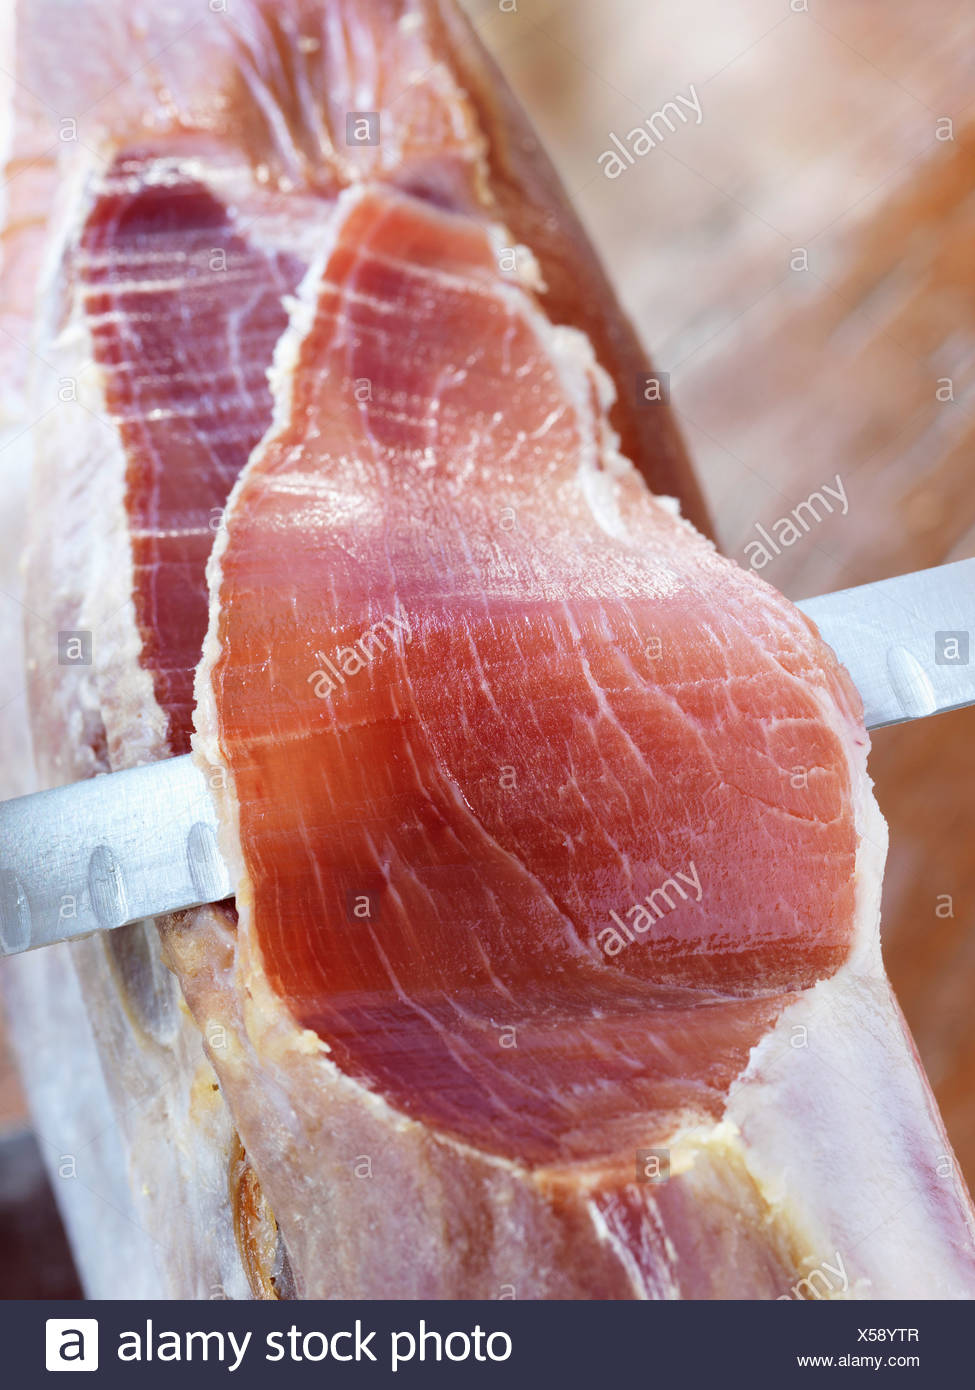 Sculpture d'un jambon Serrano Photo Stock